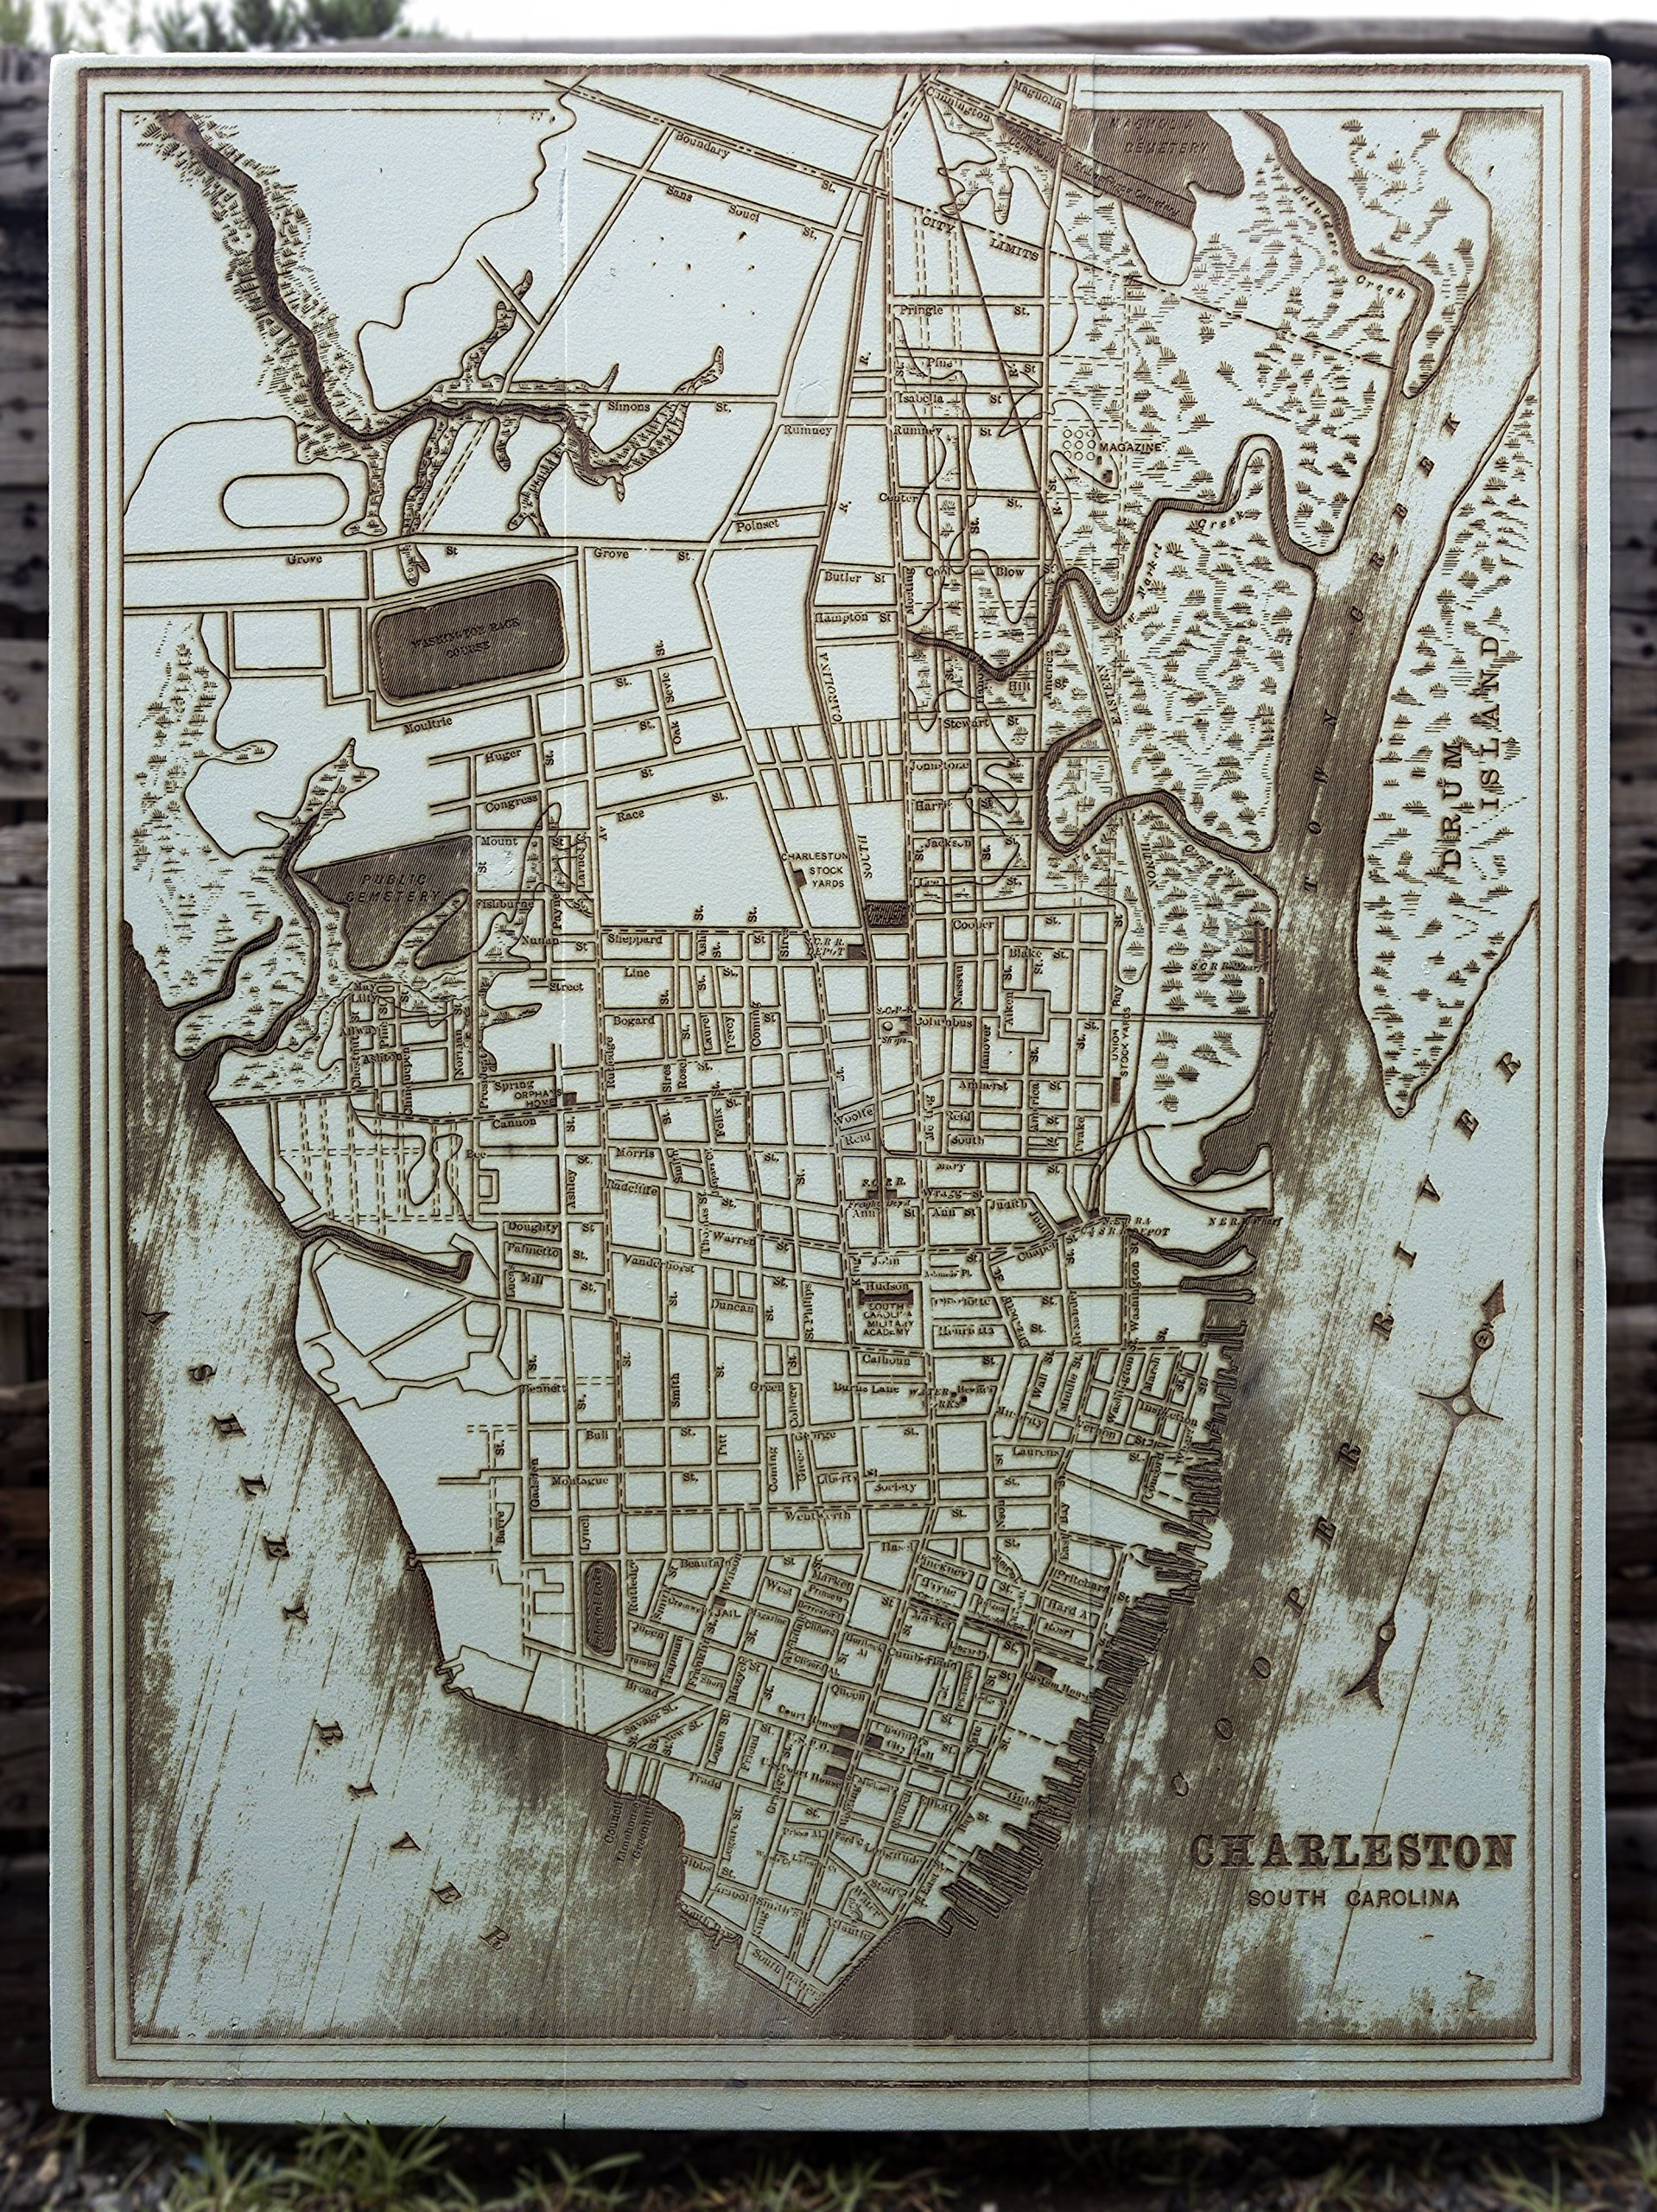 Downtown Charleston - 1898 wood engraved map